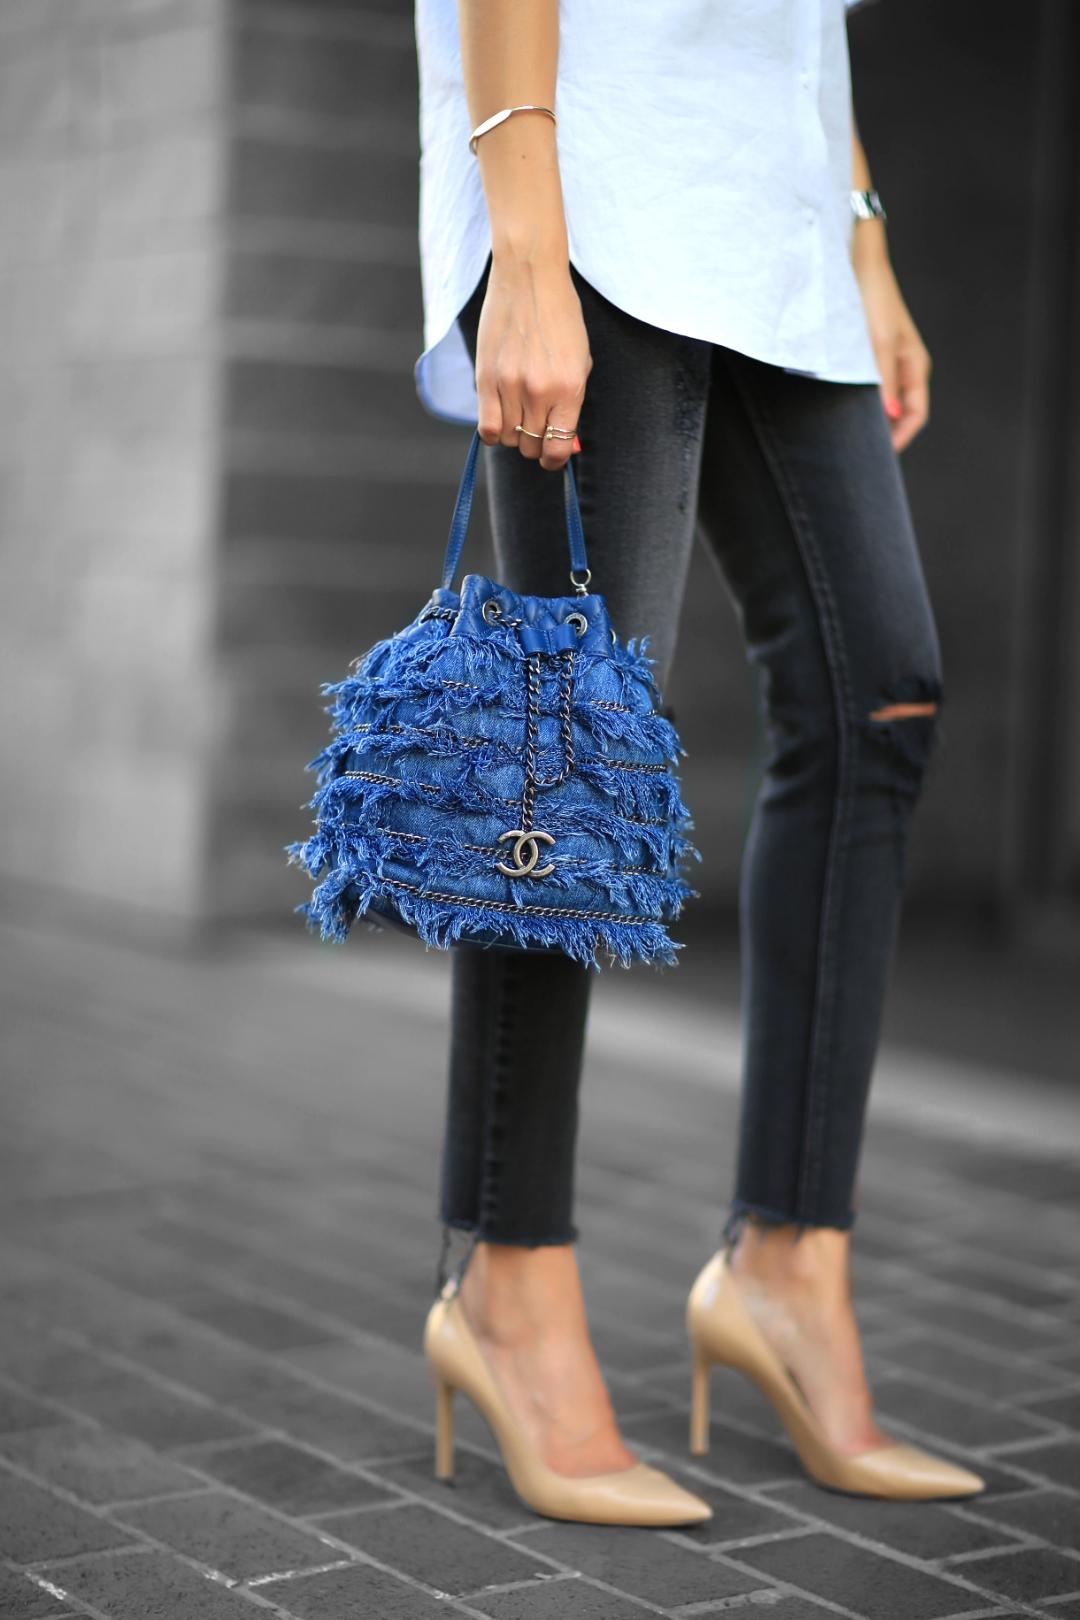 Chanel_DesignerVault_ReisDenim_ManoloBlahnik_Zara_LucysWhims_Streetstyle.jpg